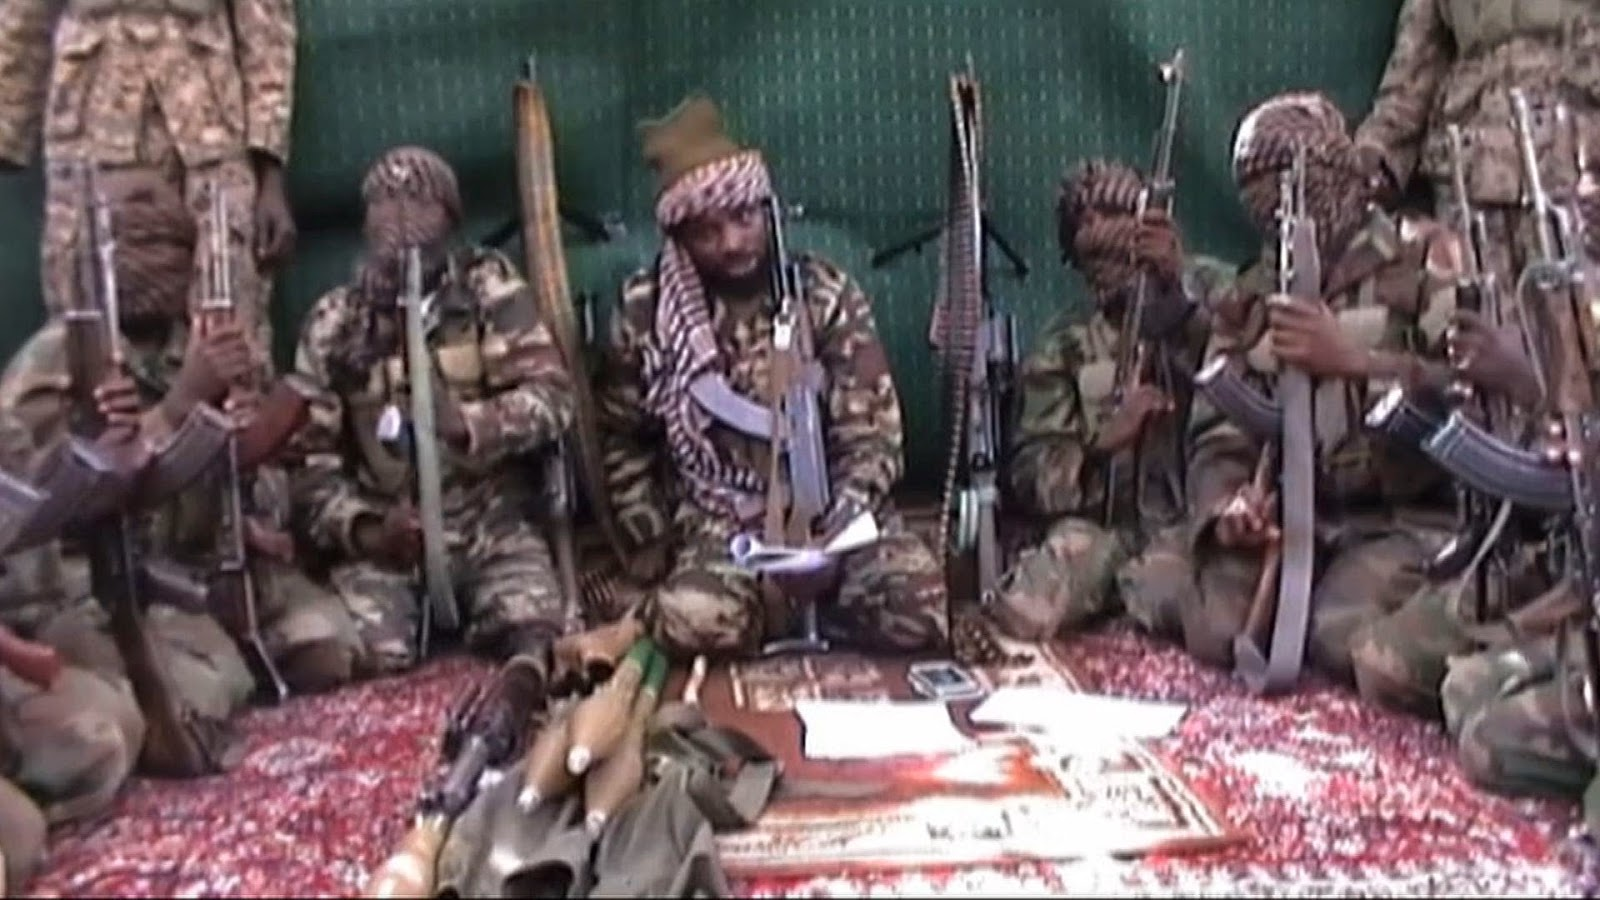 BREAKING NEWS: Ongoing Attack in 'Kautikari' a Village Near 'Chibok '